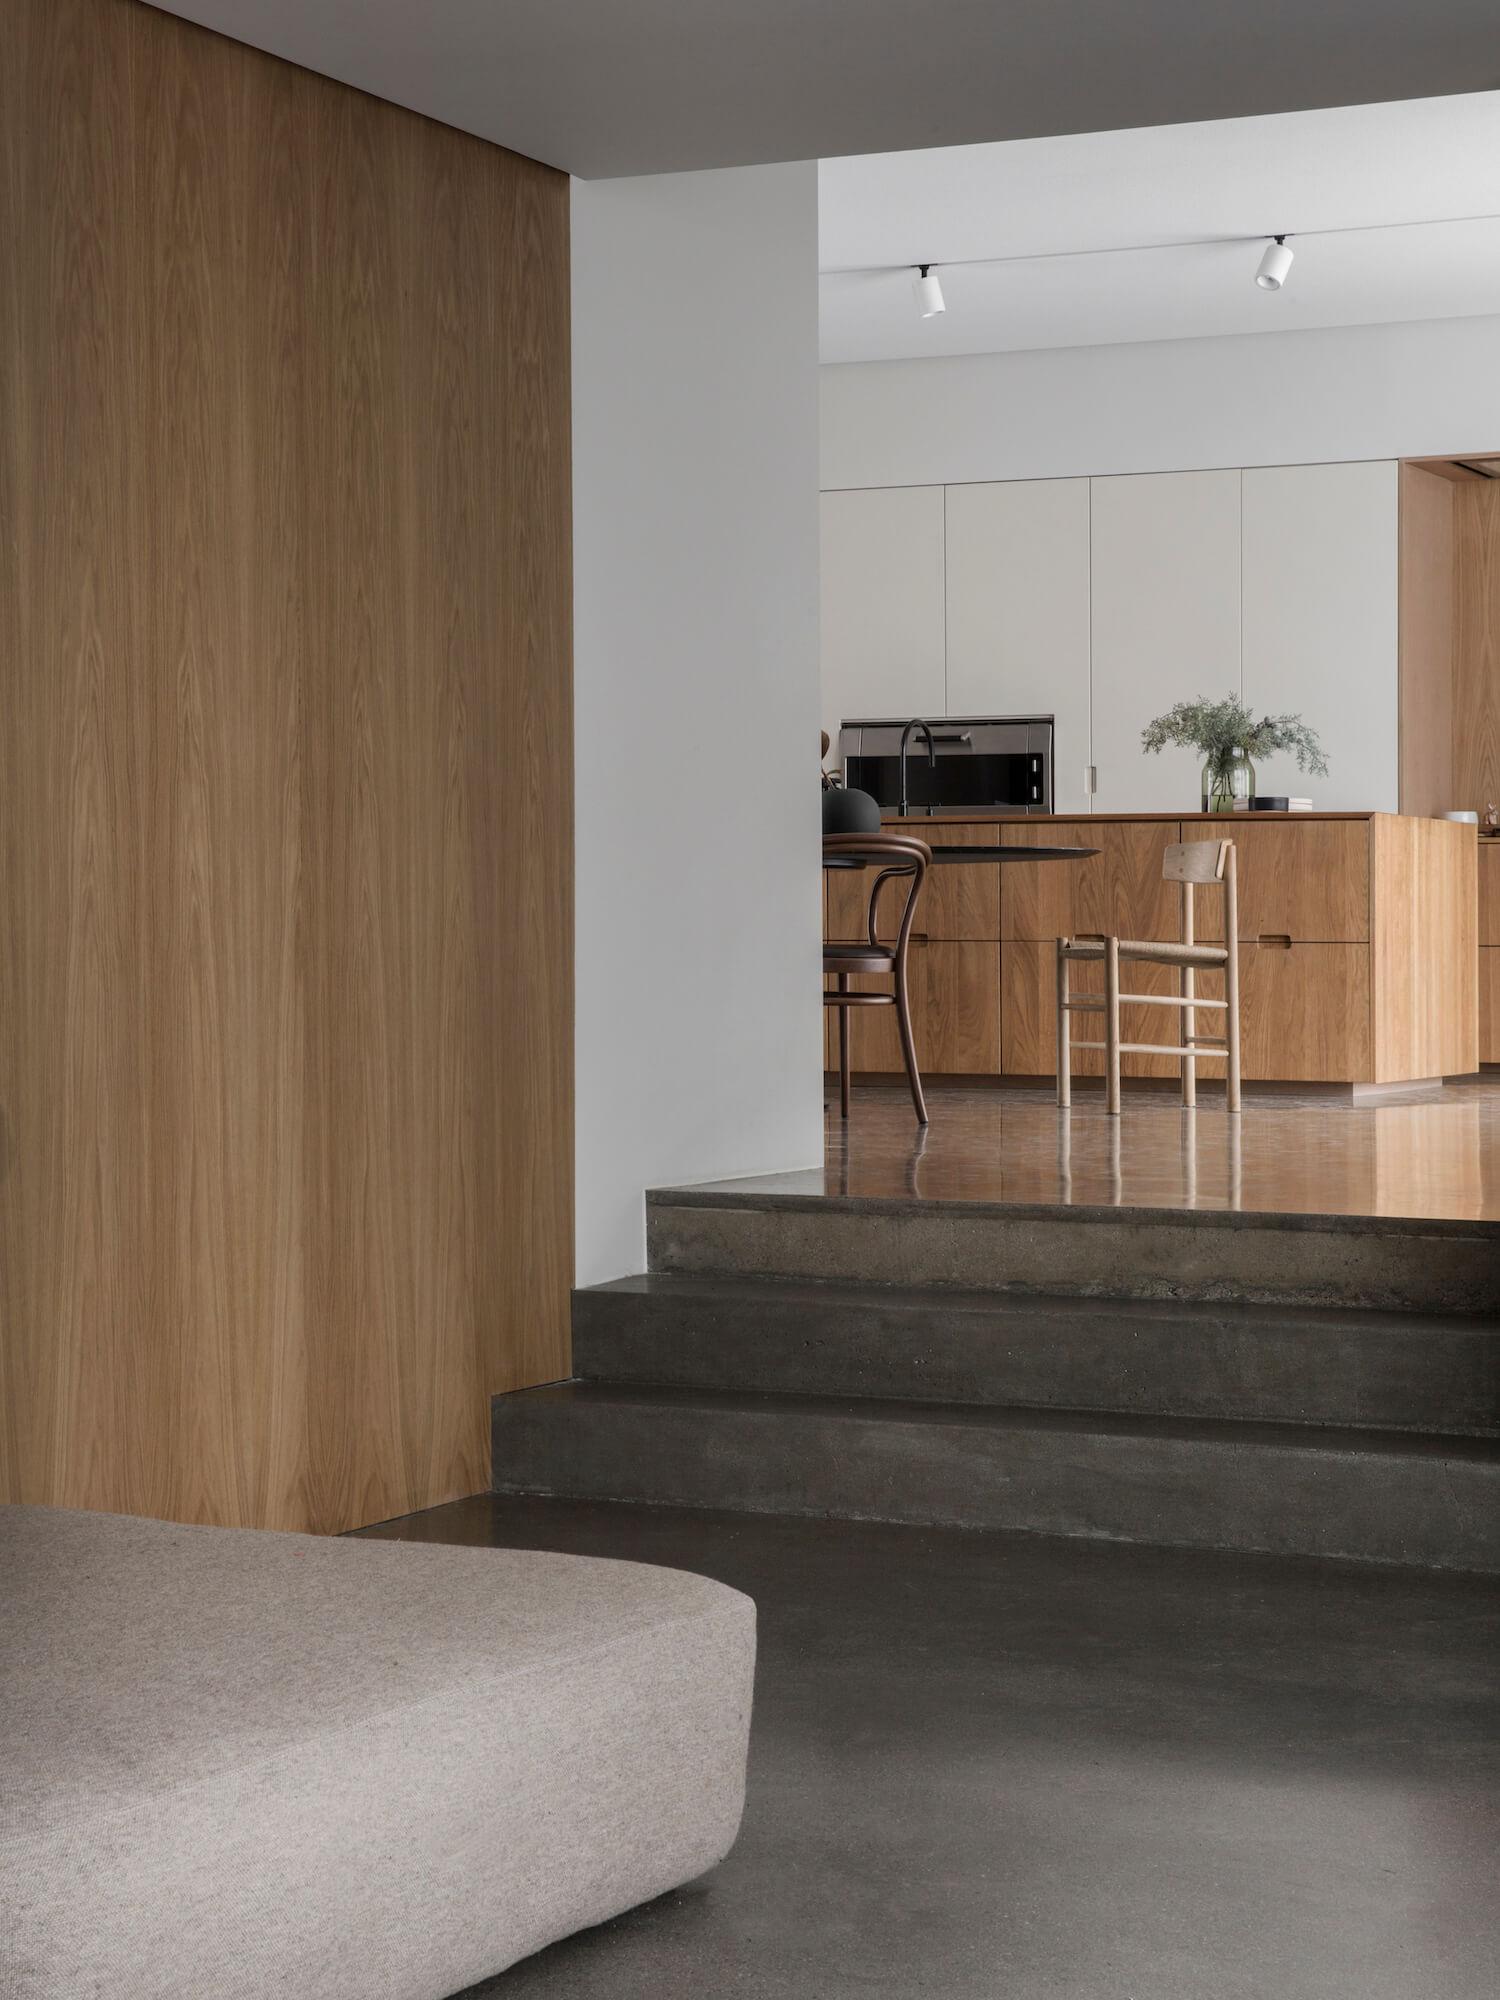 est living gjoevik house norm architects 13